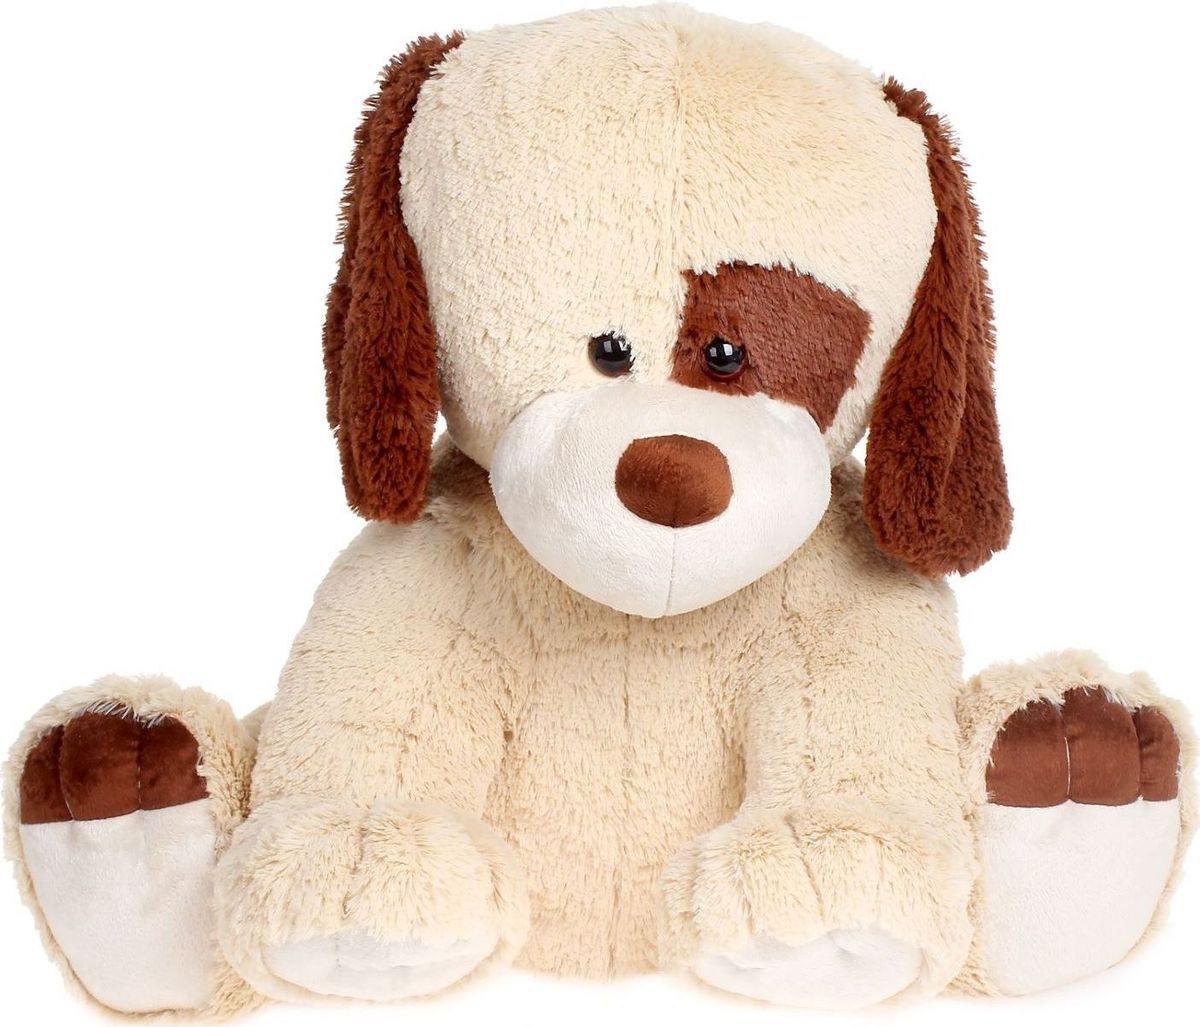 Sima-land Мягкая игрушка Собака Джек цвет бежевый 60 см малышарики мягкая игрушка собака бассет хаунд 23 см